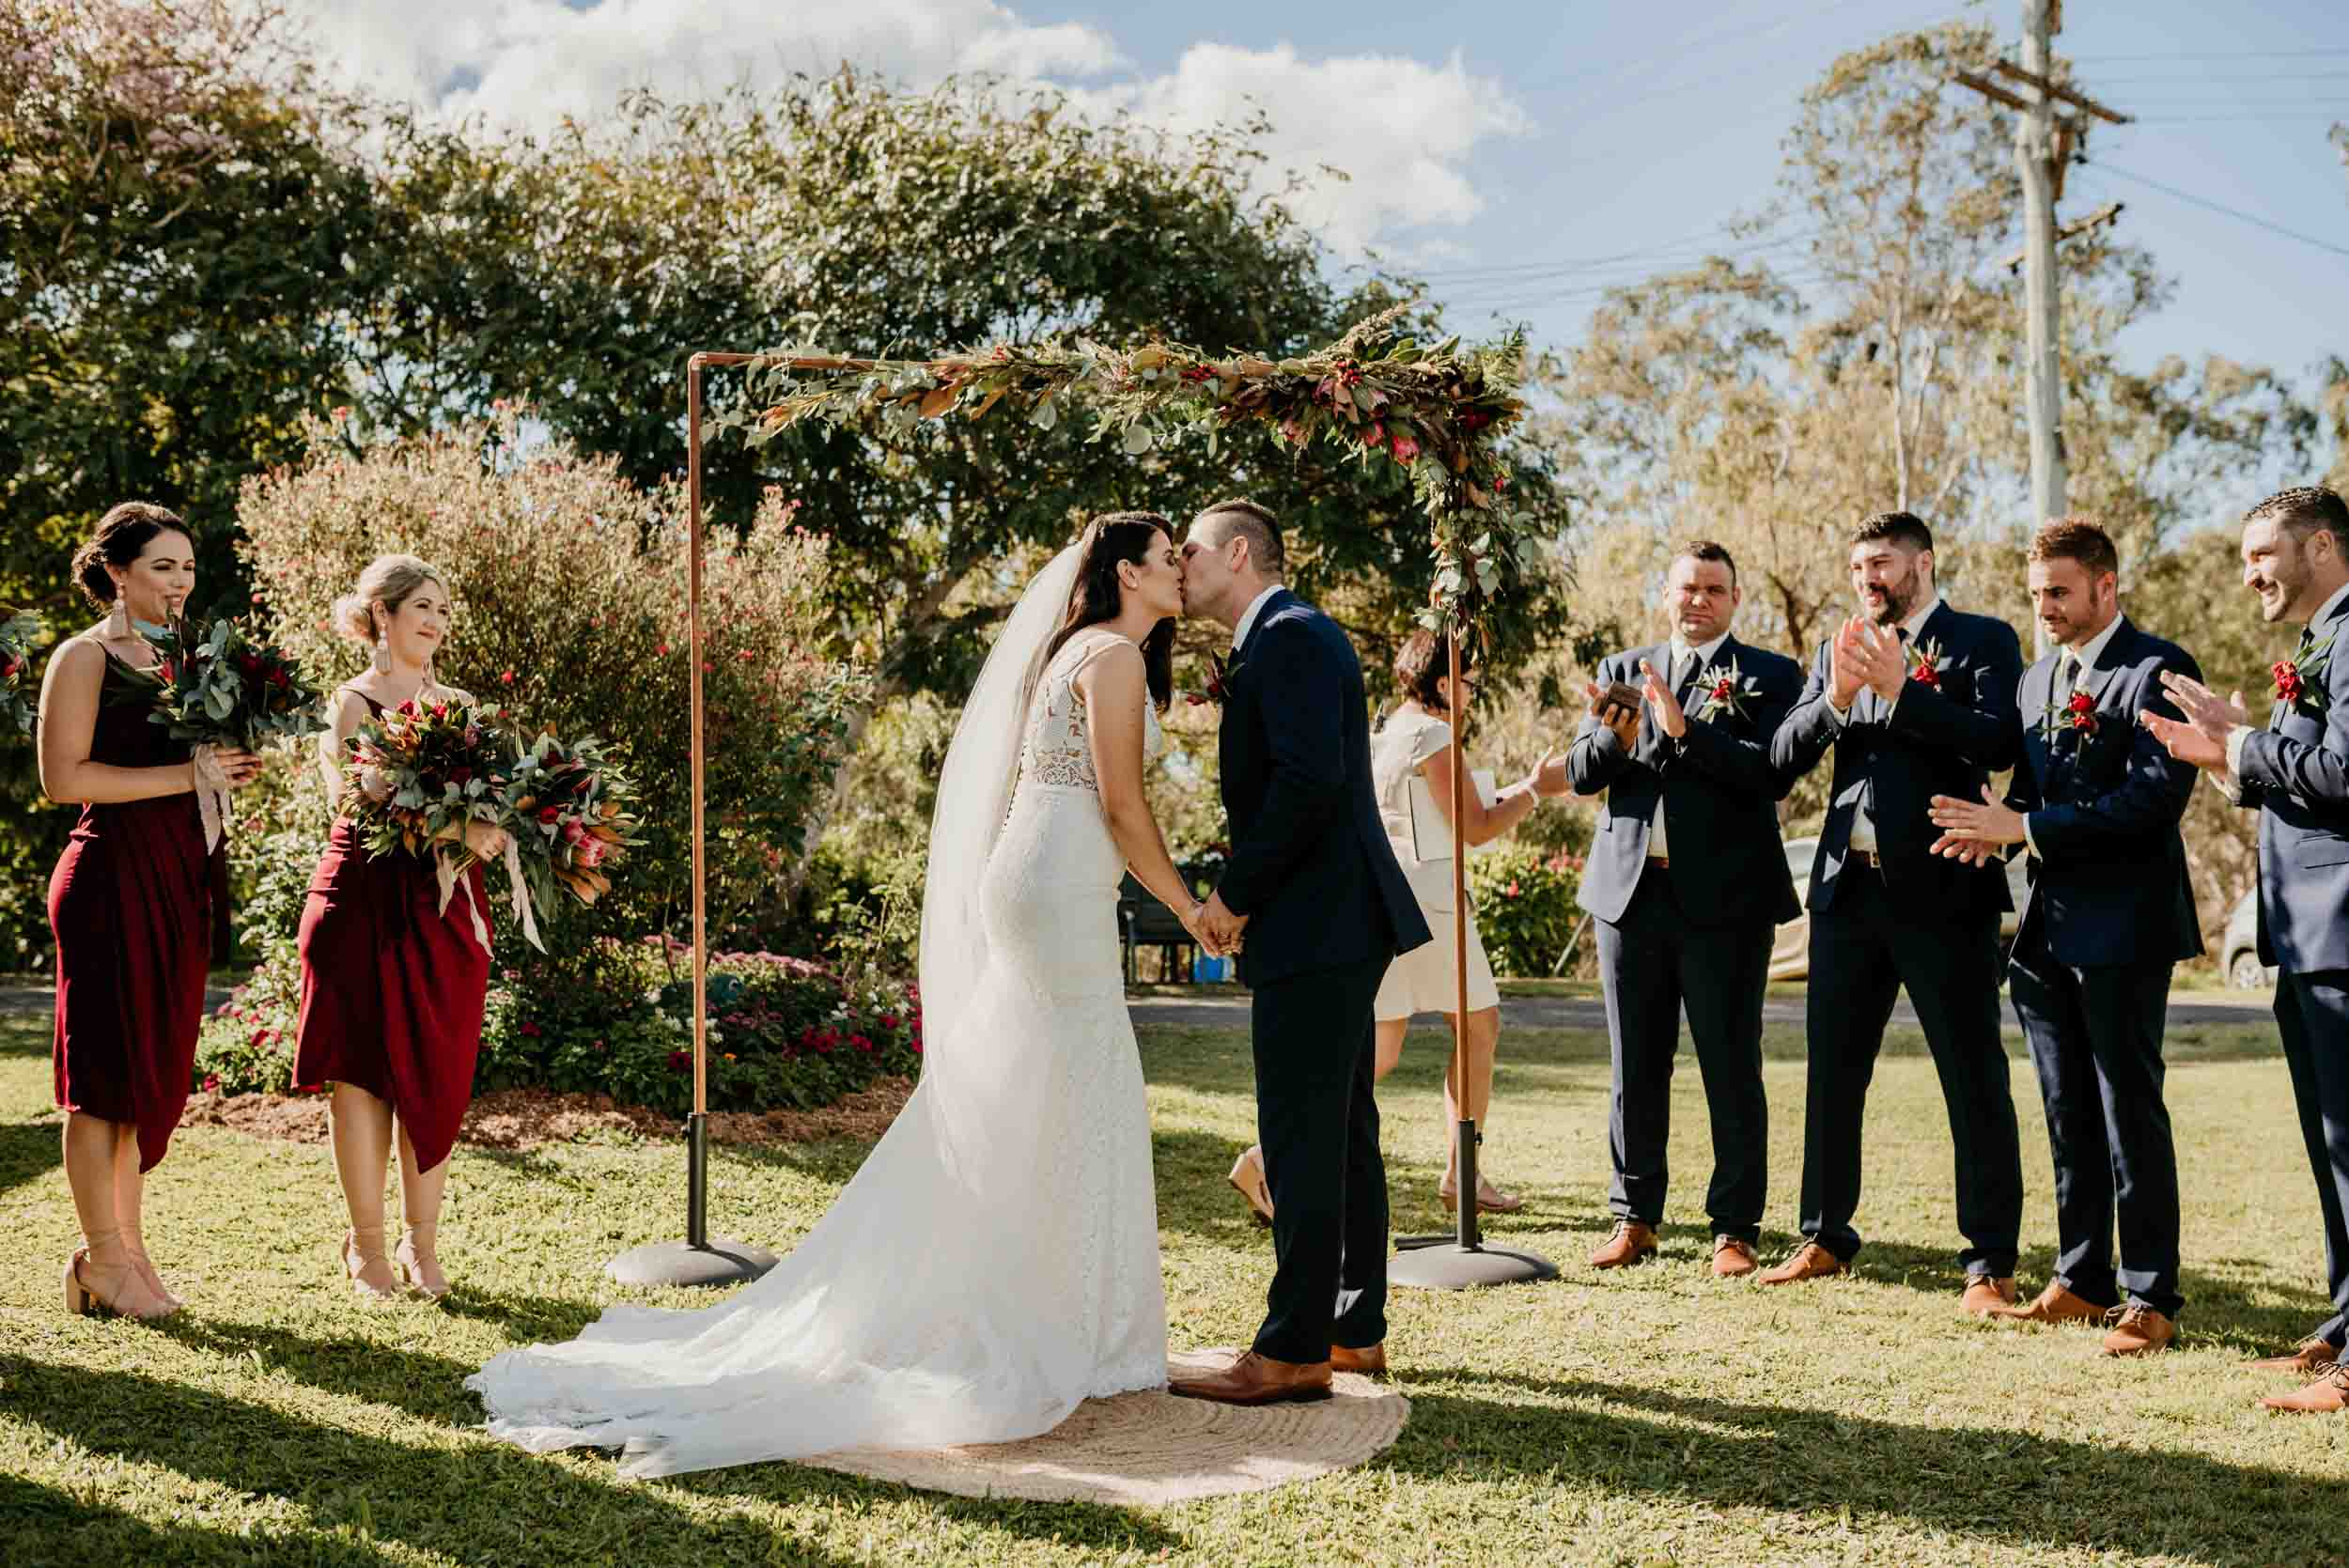 The Raw Photographer - Cairns Wedding Photographer - Atherton Tablelands - Mareeba farm Wedding - Irene Costa's Devine Bridal - Candid - Photo Package-26.jpg